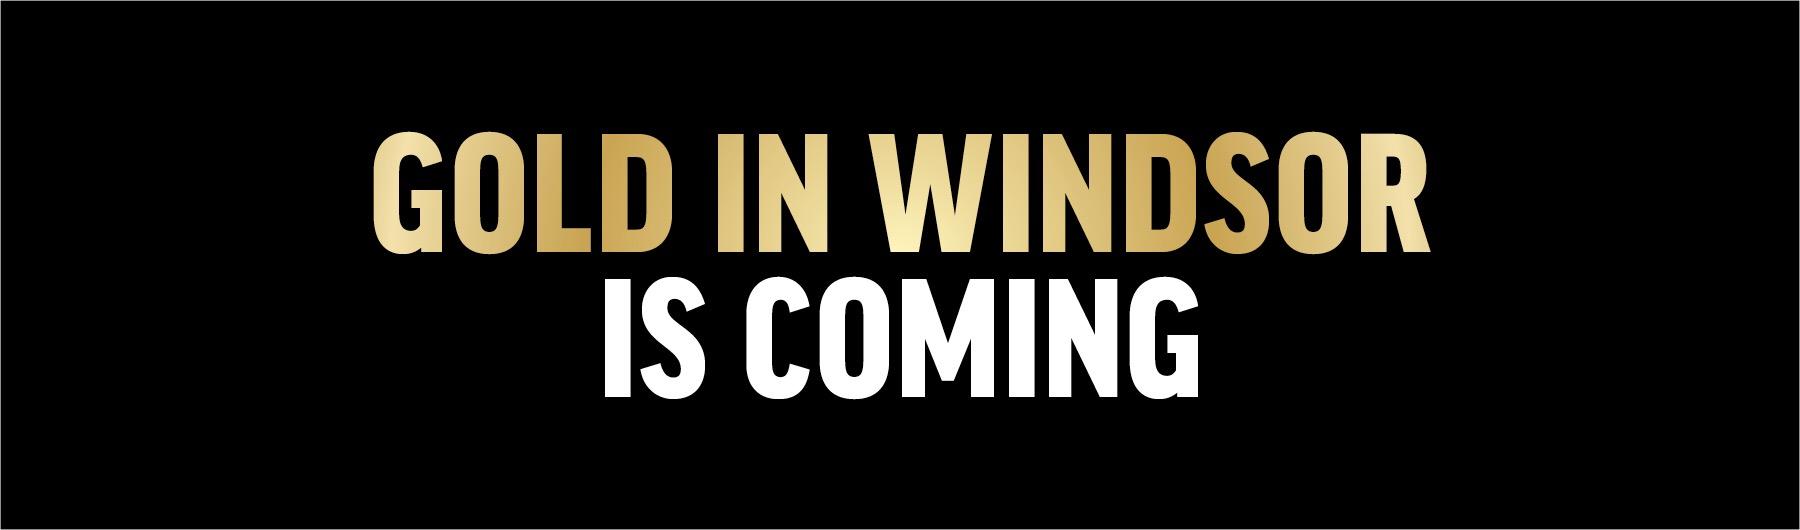 Start it. Spin it. Crank it. Kick it. Celebrate the moment. Miller Genuine Draft Presents Gold In Windsor.